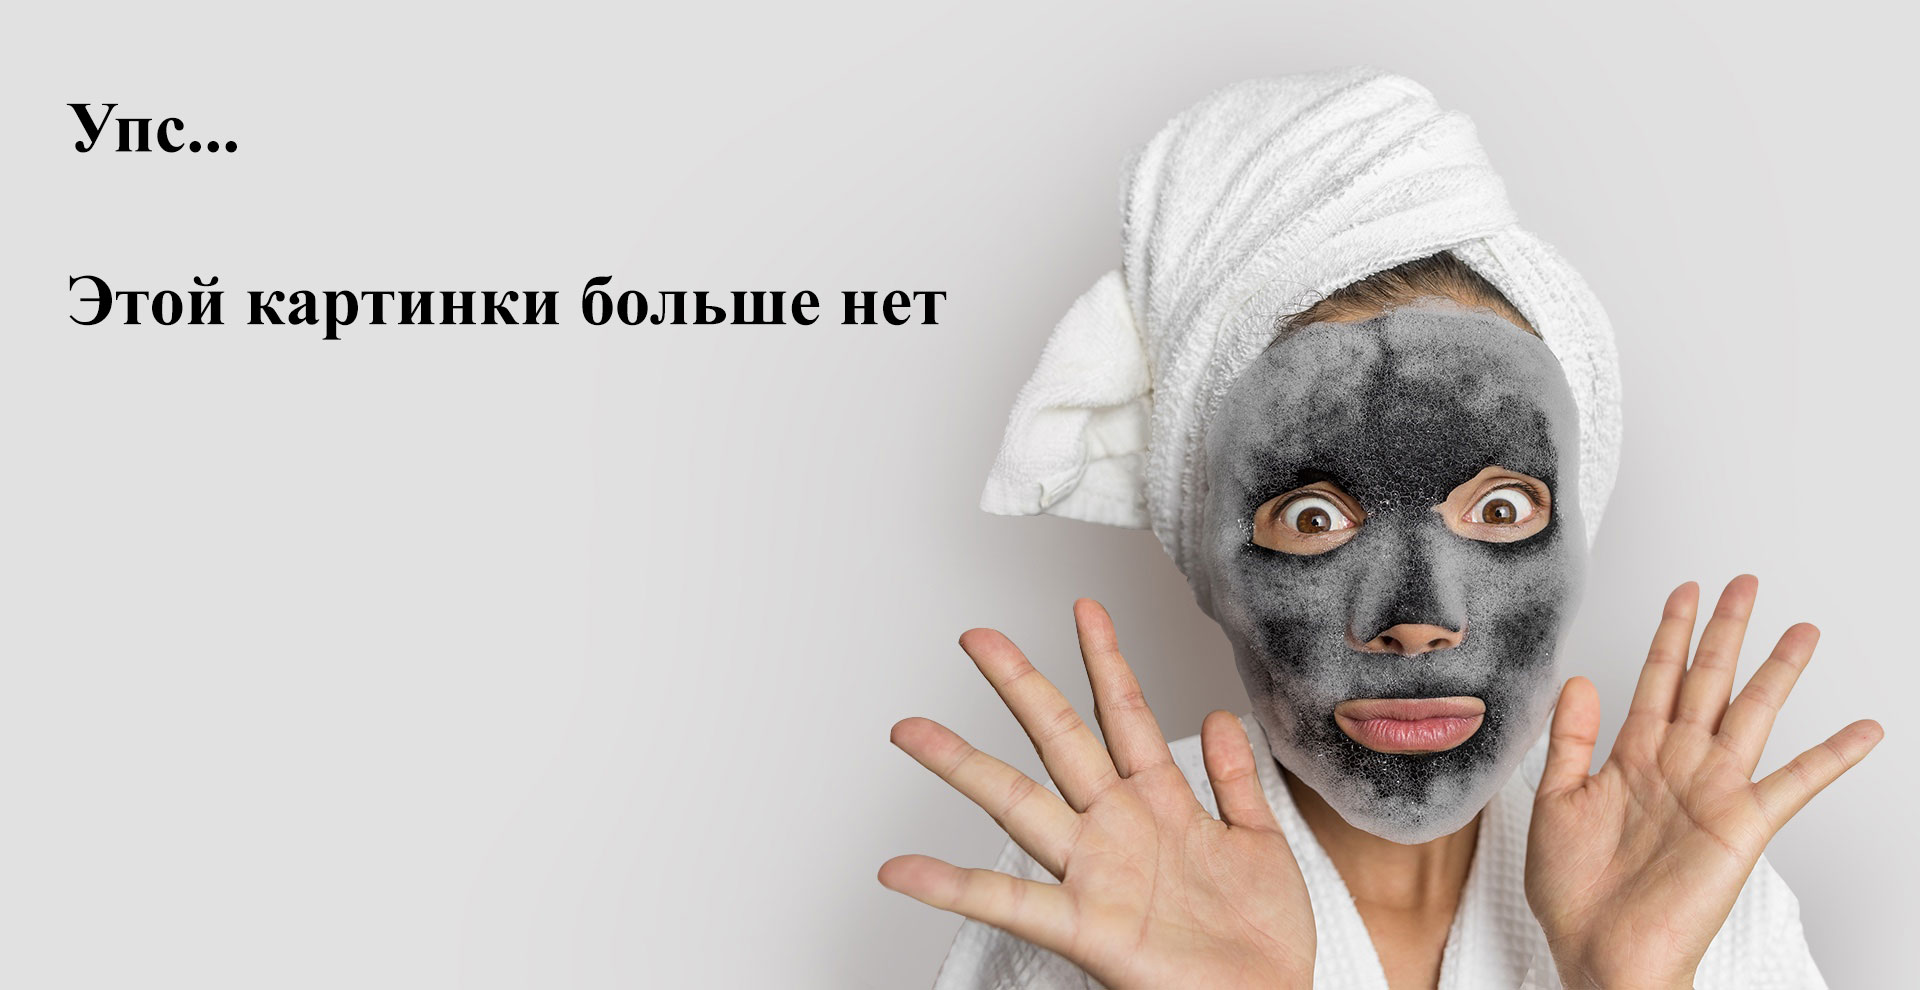 ruNail, УФ-гель цветной (Мэрилин, Marilyn), 7,5 г